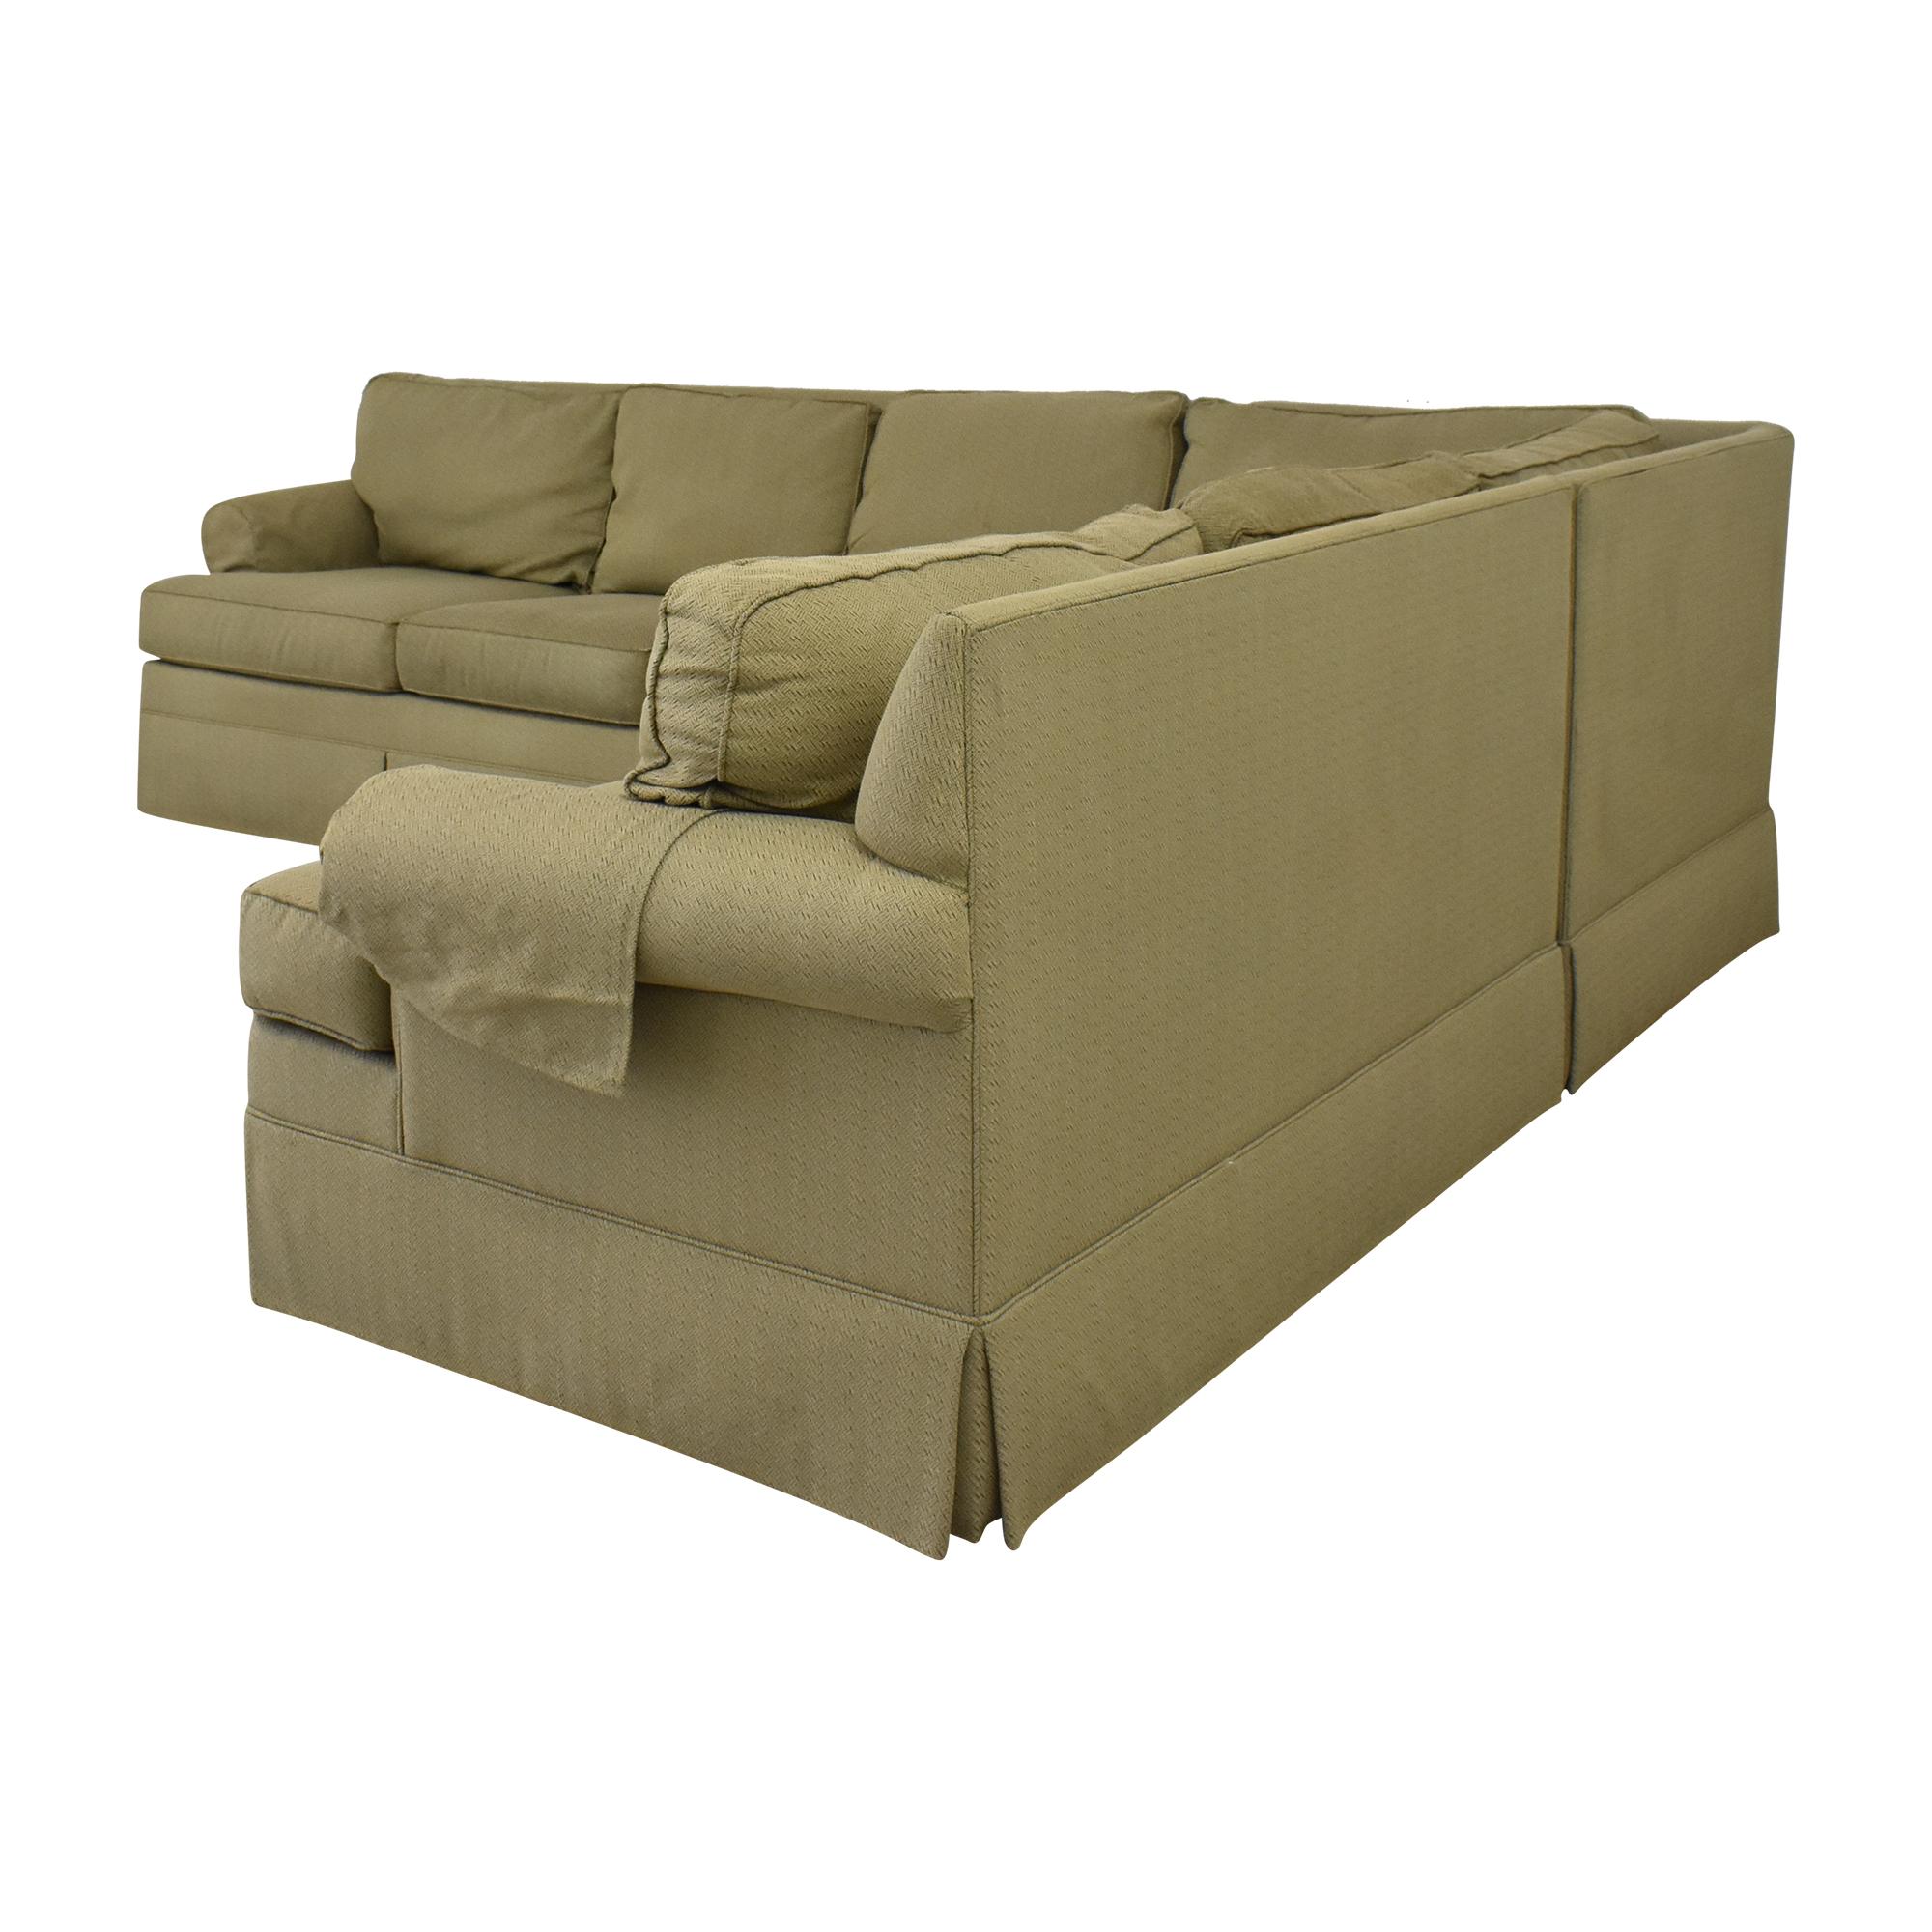 Ethan Allen Ethan Allan Skirted Sectional Sofa ct